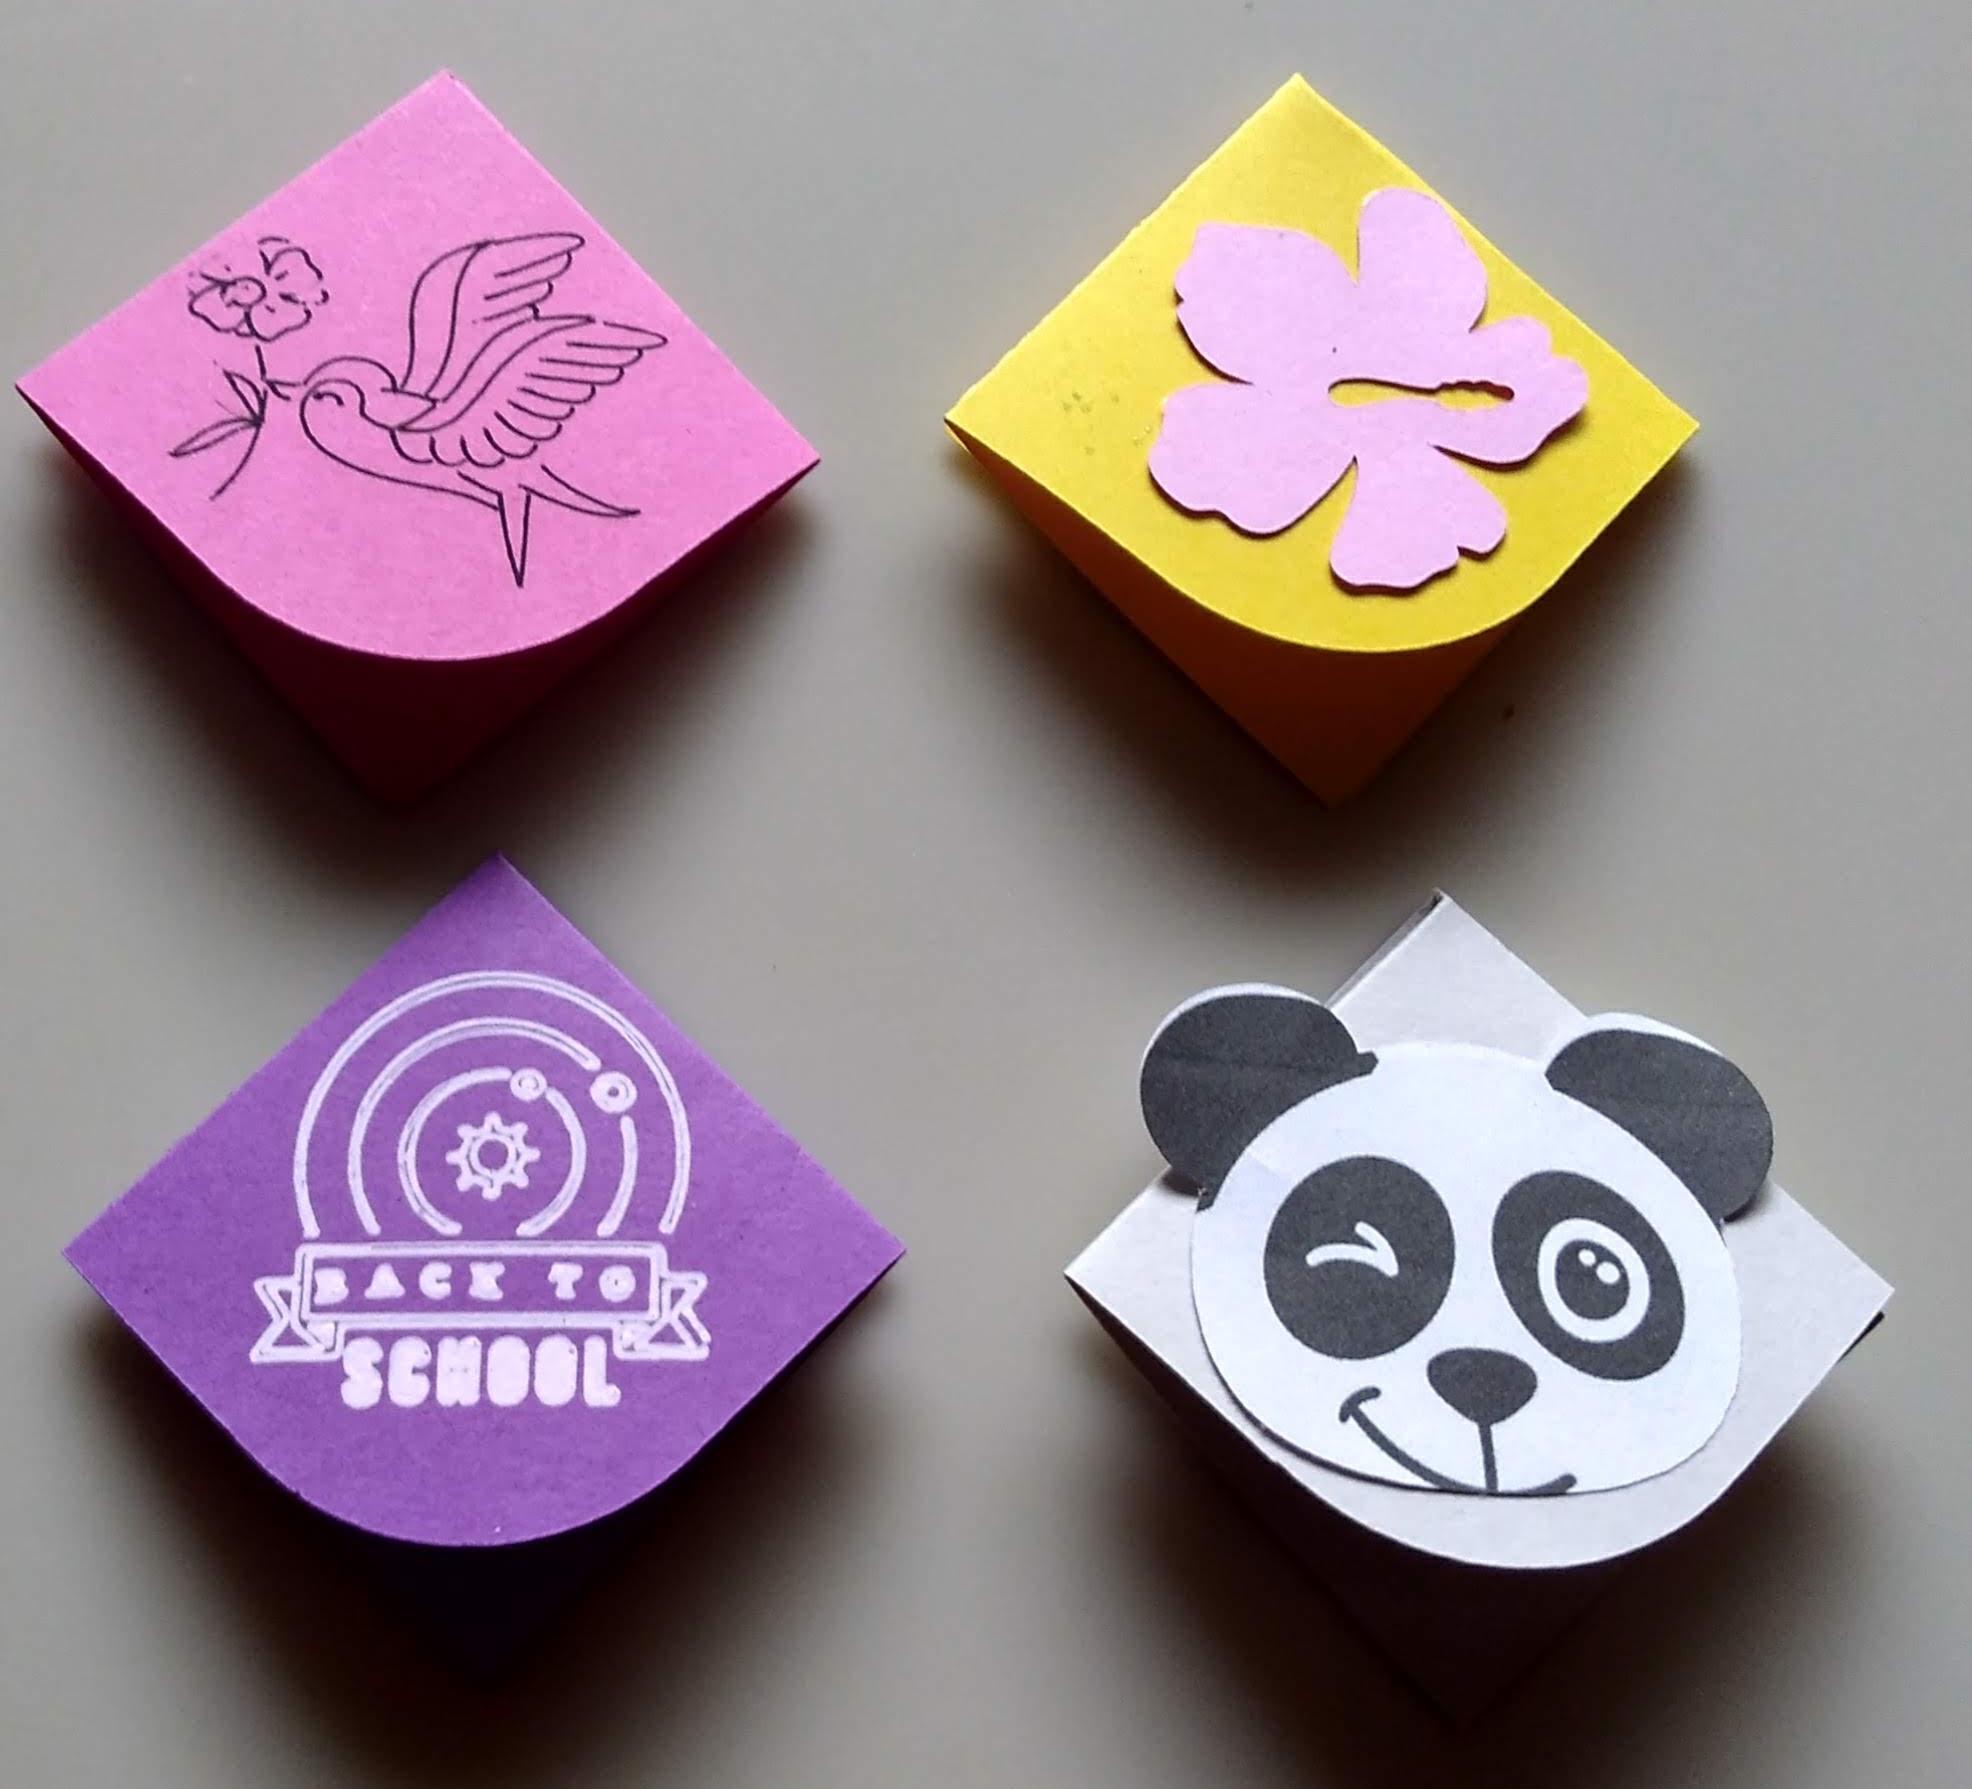 Small Bookmarks AKA Page Corner Bookmarks